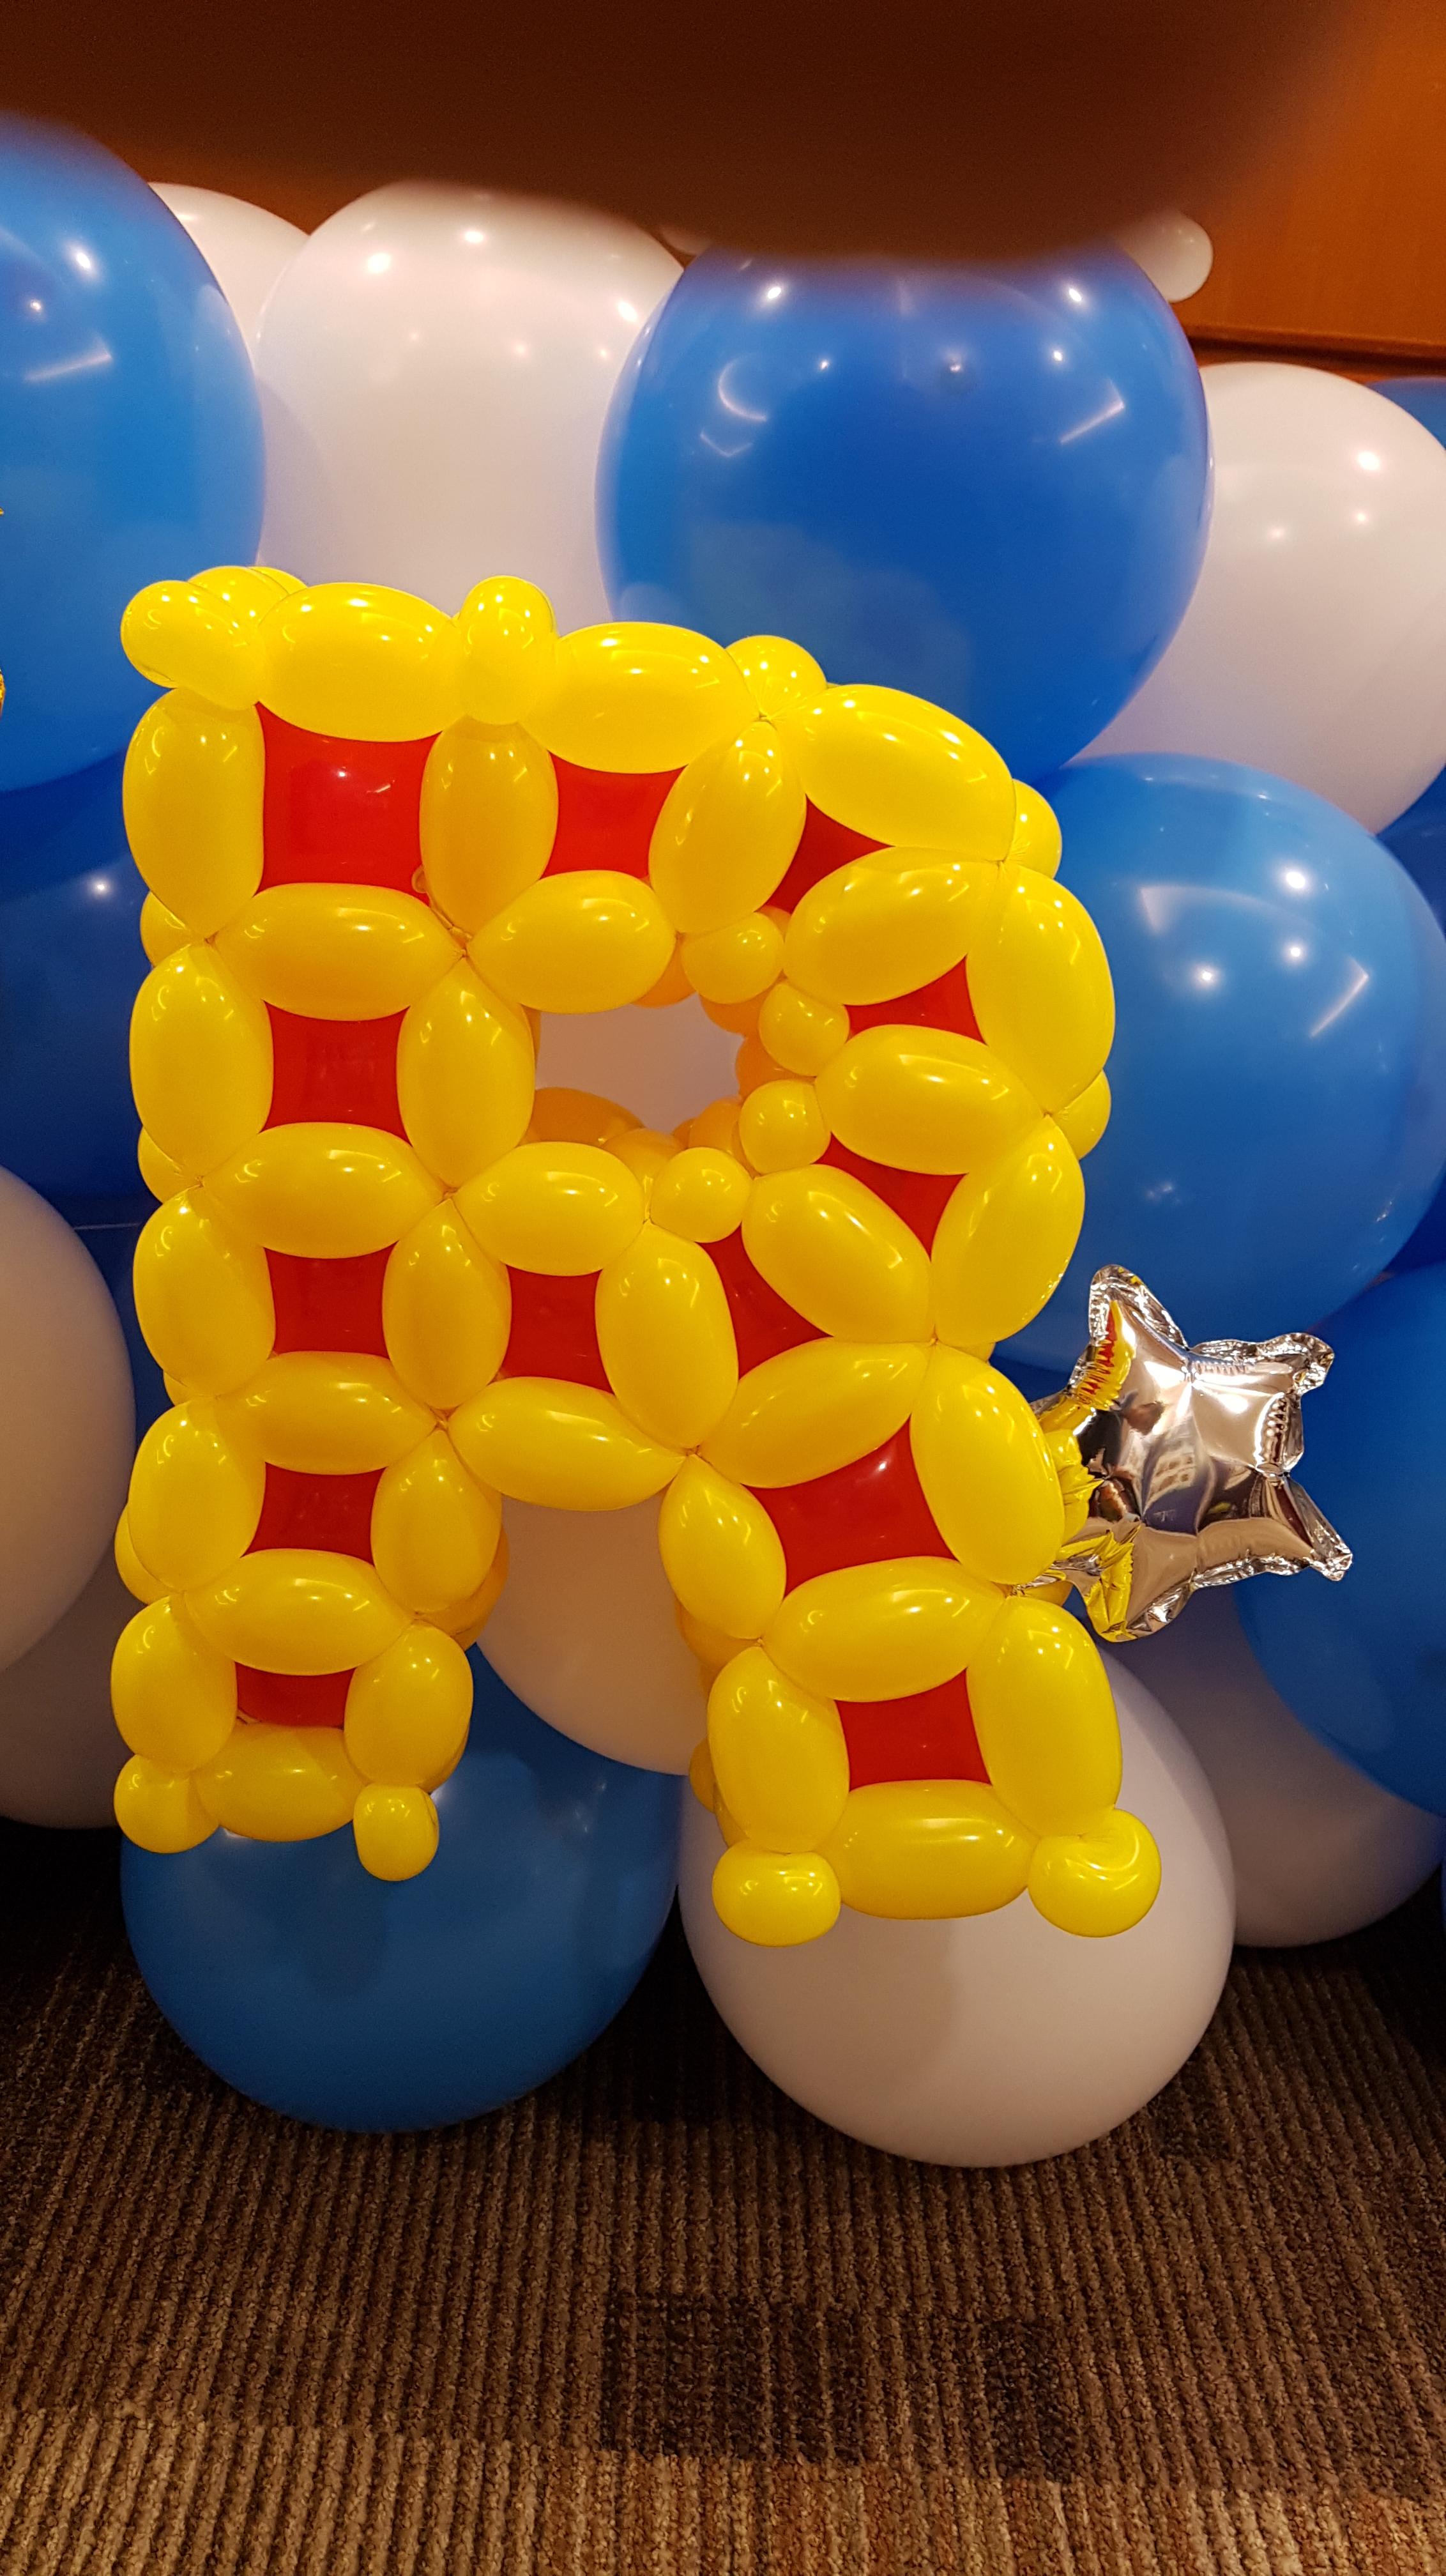 , Balloon Alphabets, Singapore Balloon Decoration Services - Balloon Workshop and Balloon Sculpting